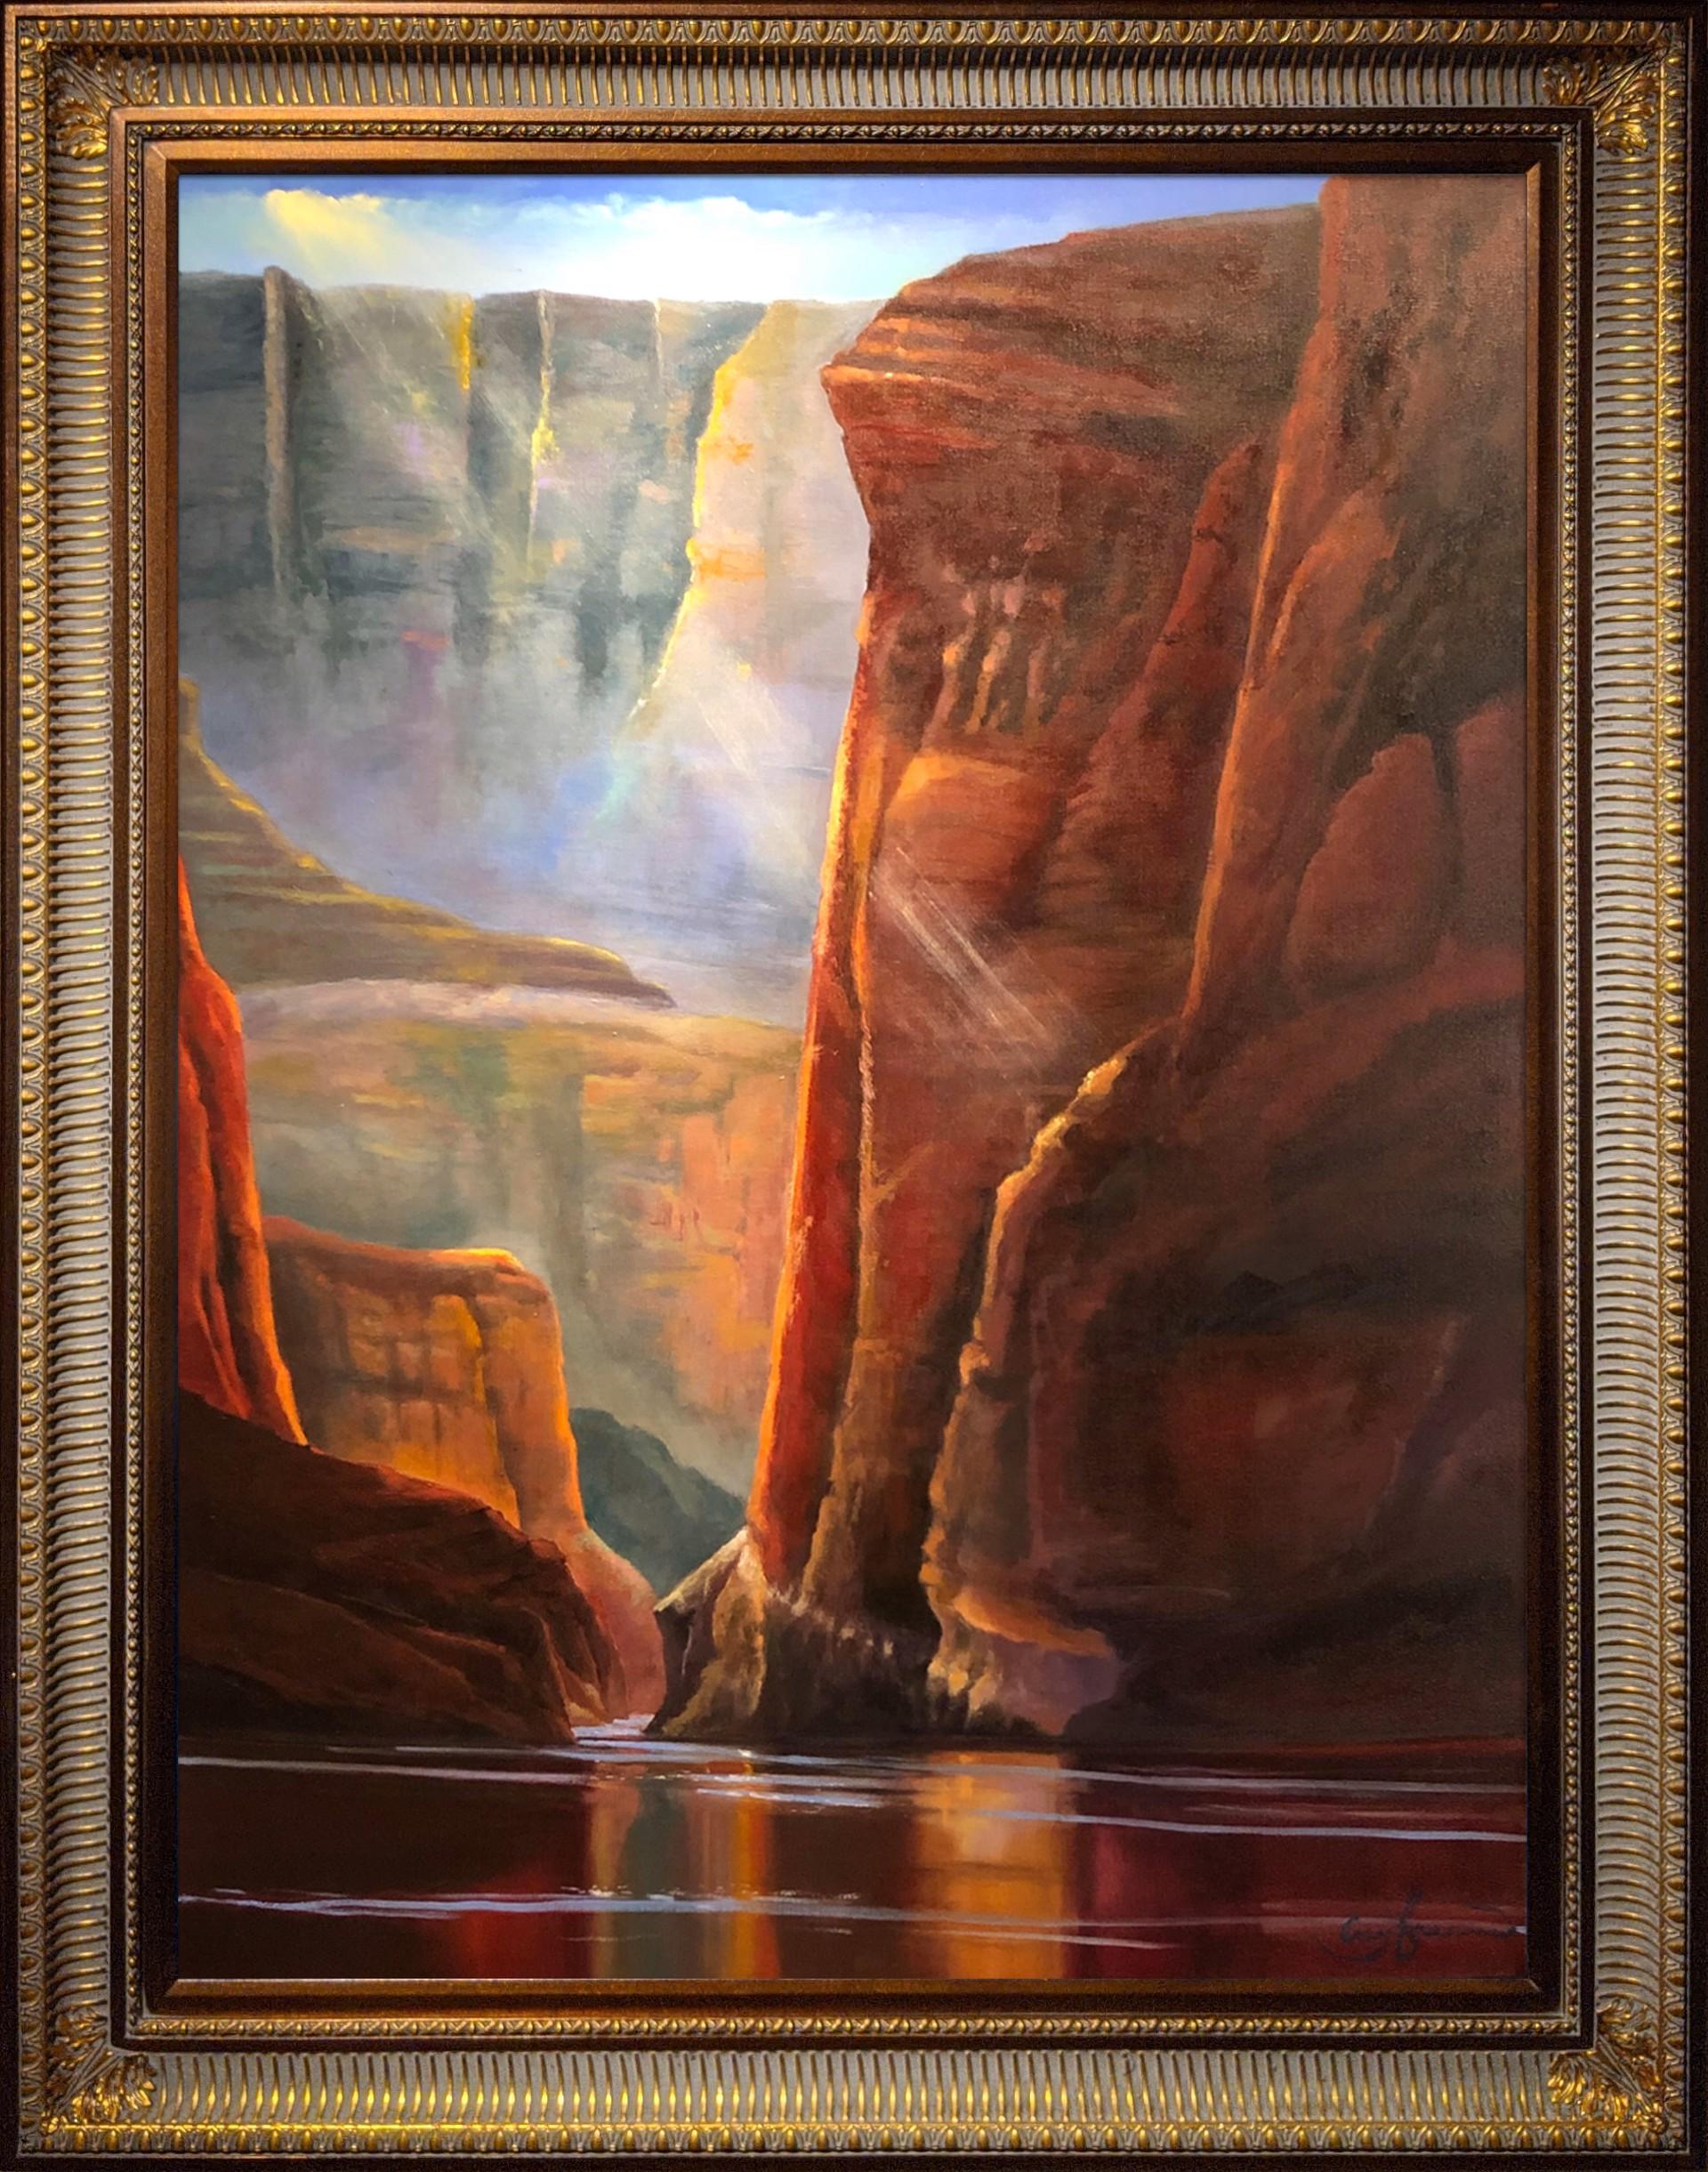 Peaceful Reflection by Craig Freeman